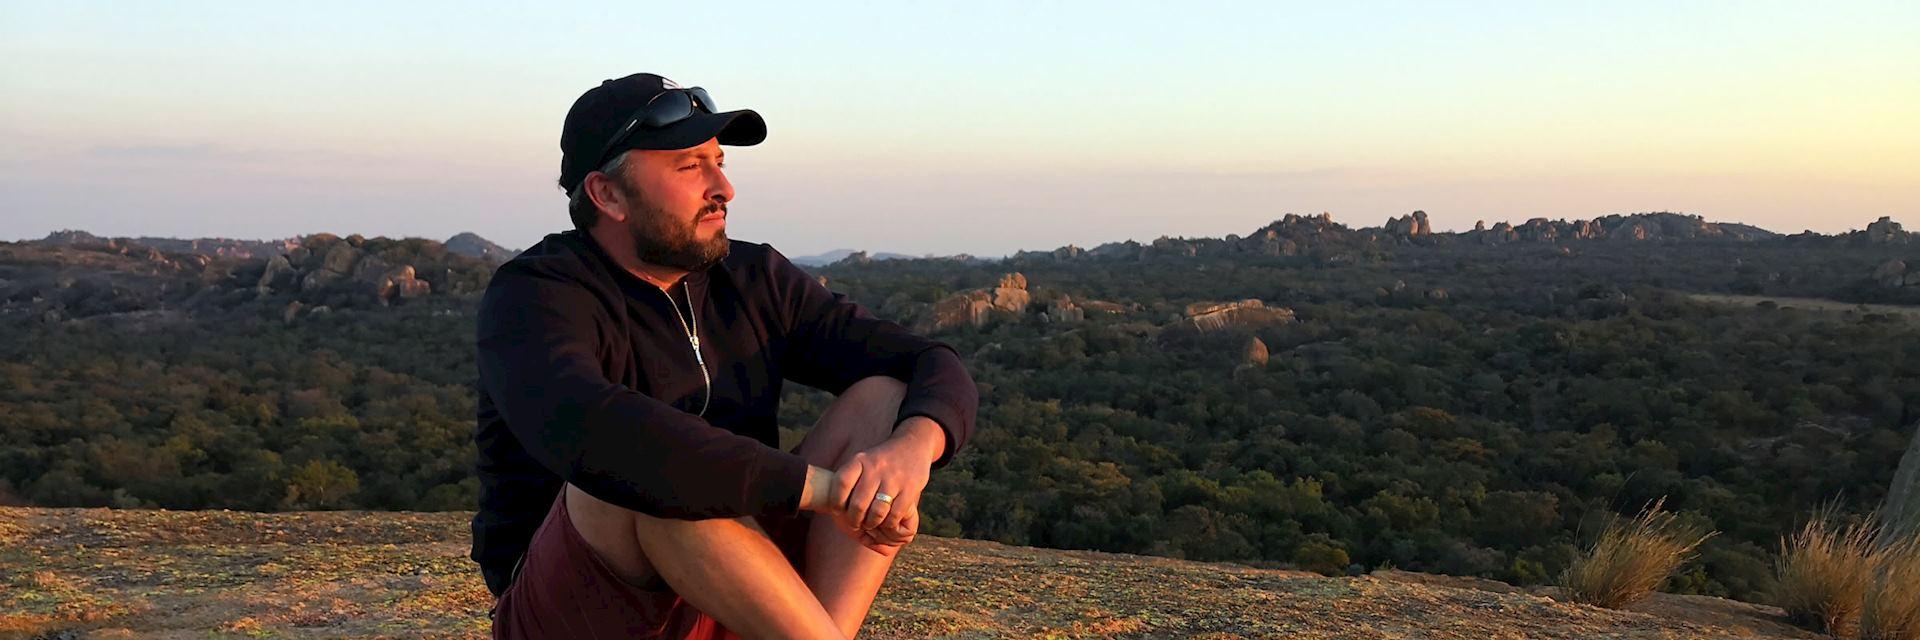 Tony in the Matopos Hills, Zimbabwe